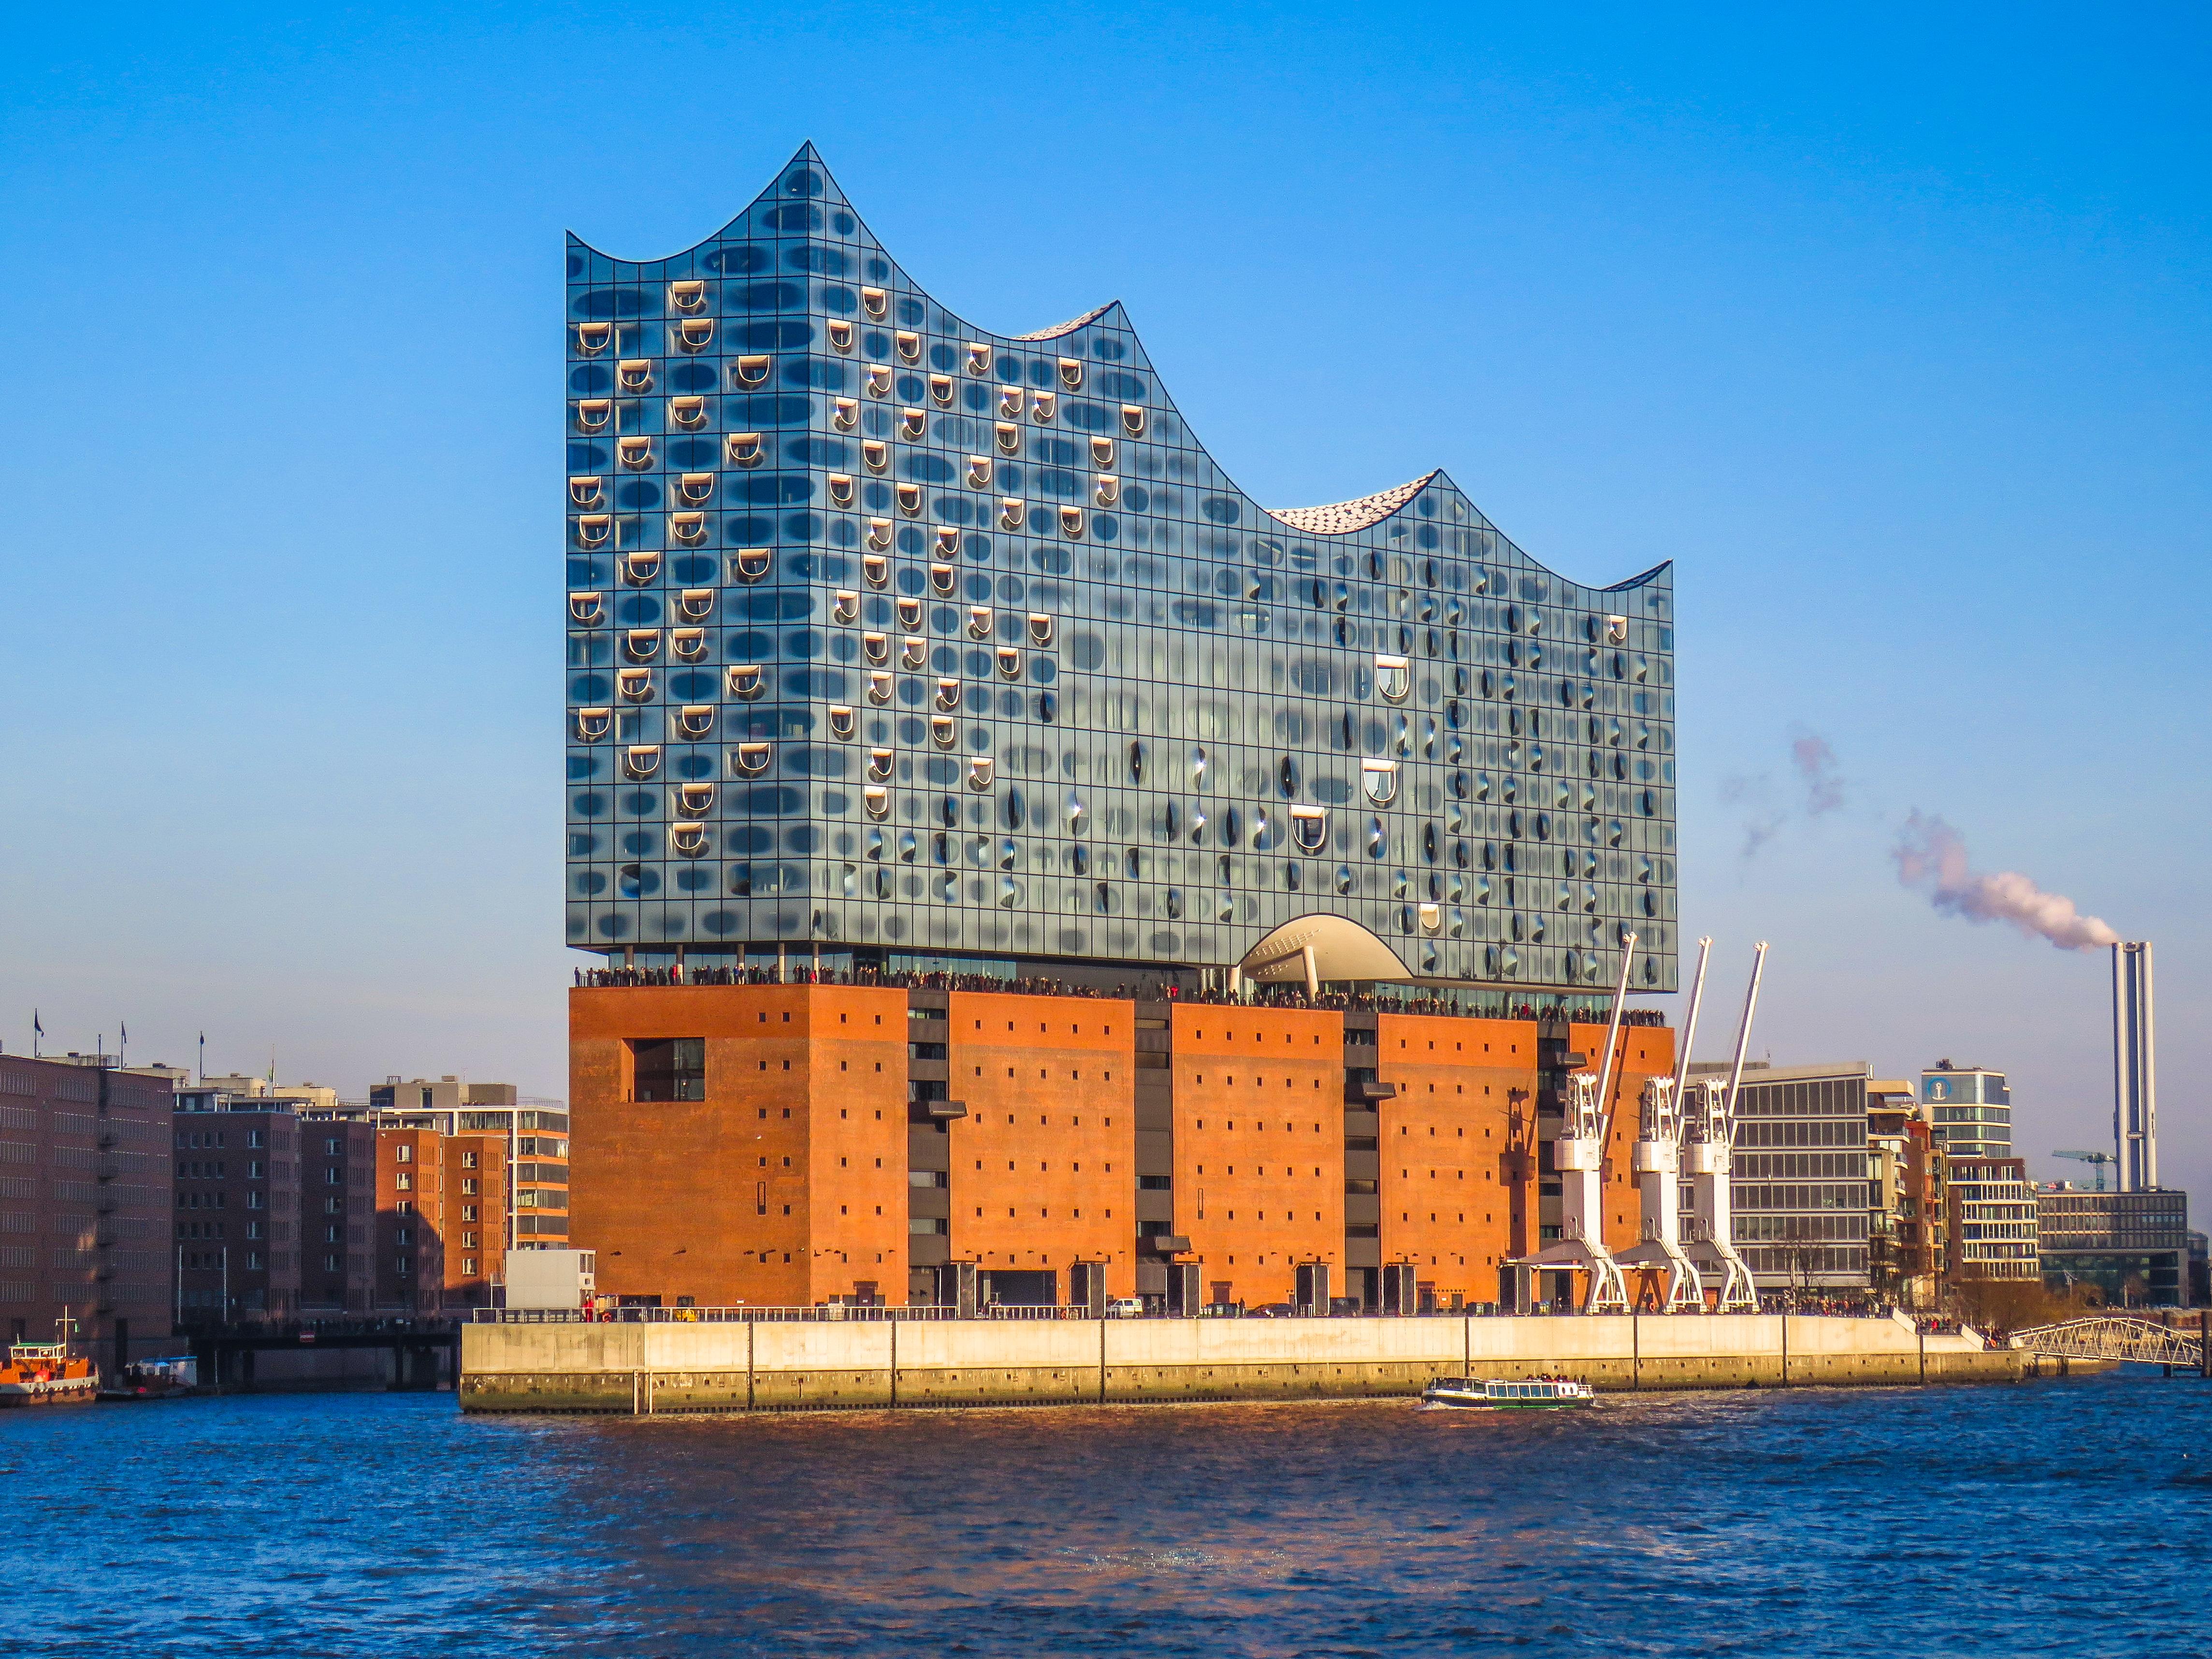 Baufirma Hamburg elbphilharmonie